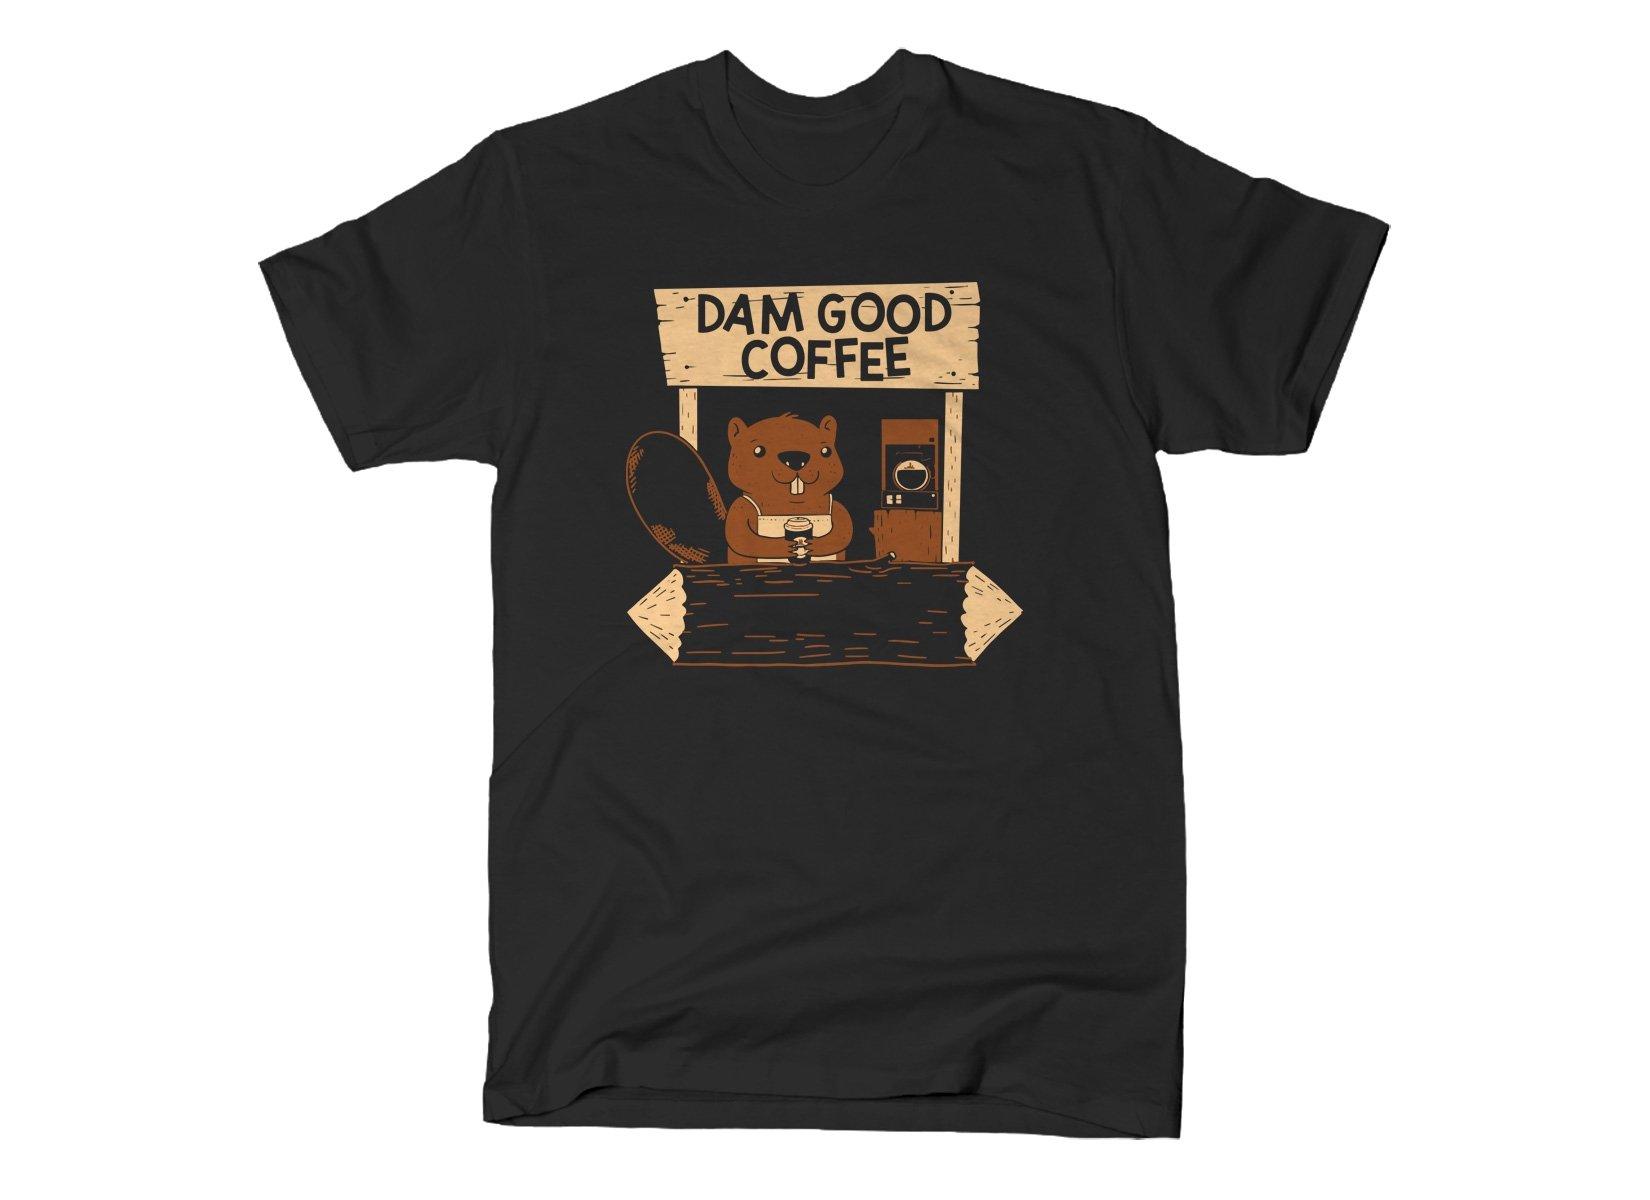 Dam Good Coffee on Mens T-Shirt